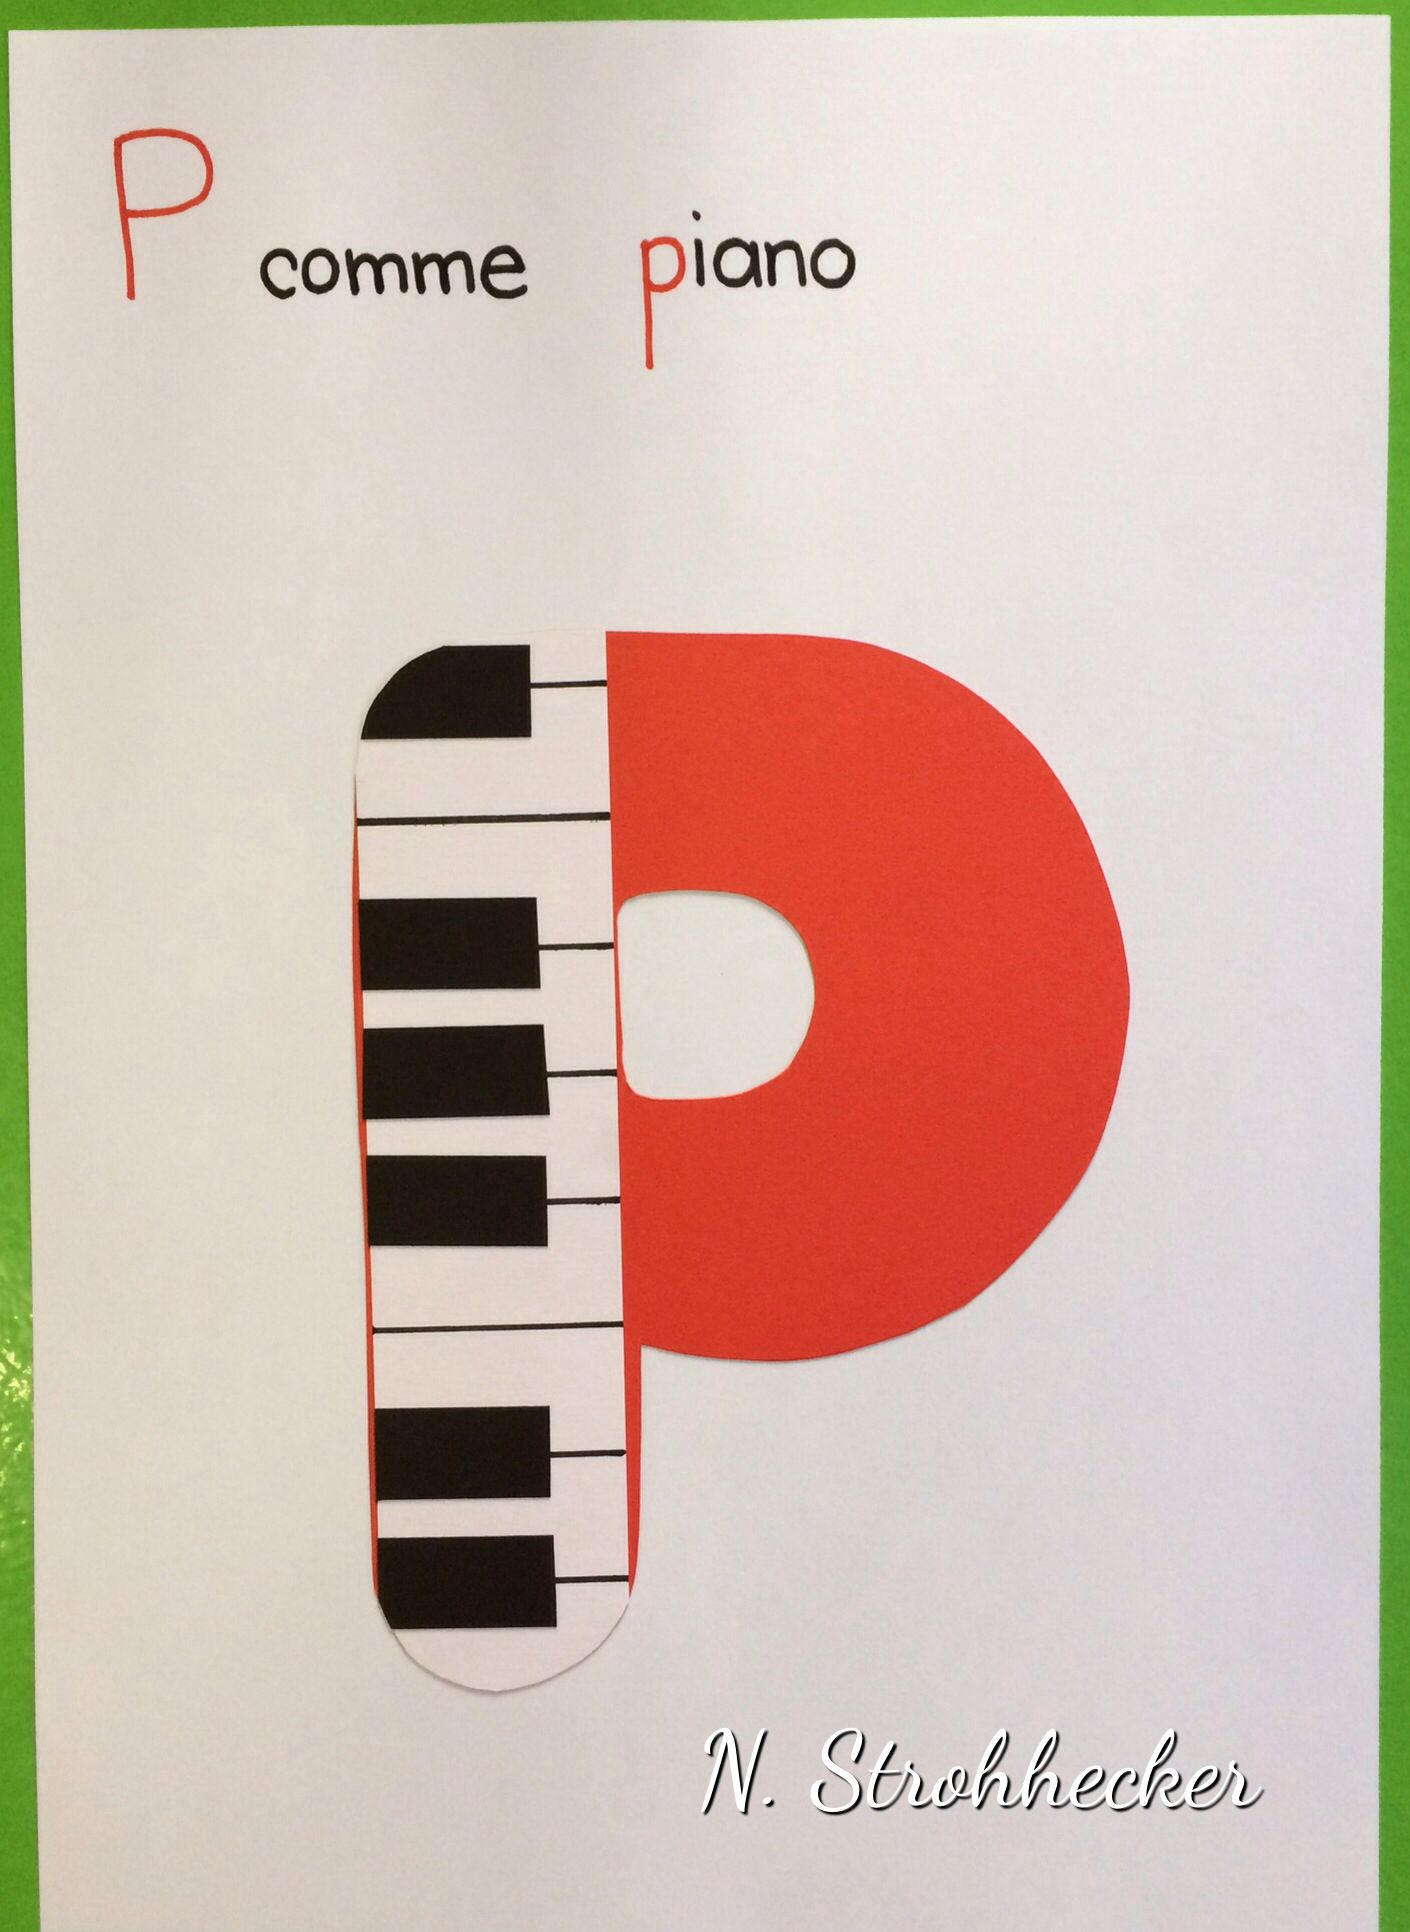 P comme piano | Alphabet letter crafts, Alphabet crafts ...